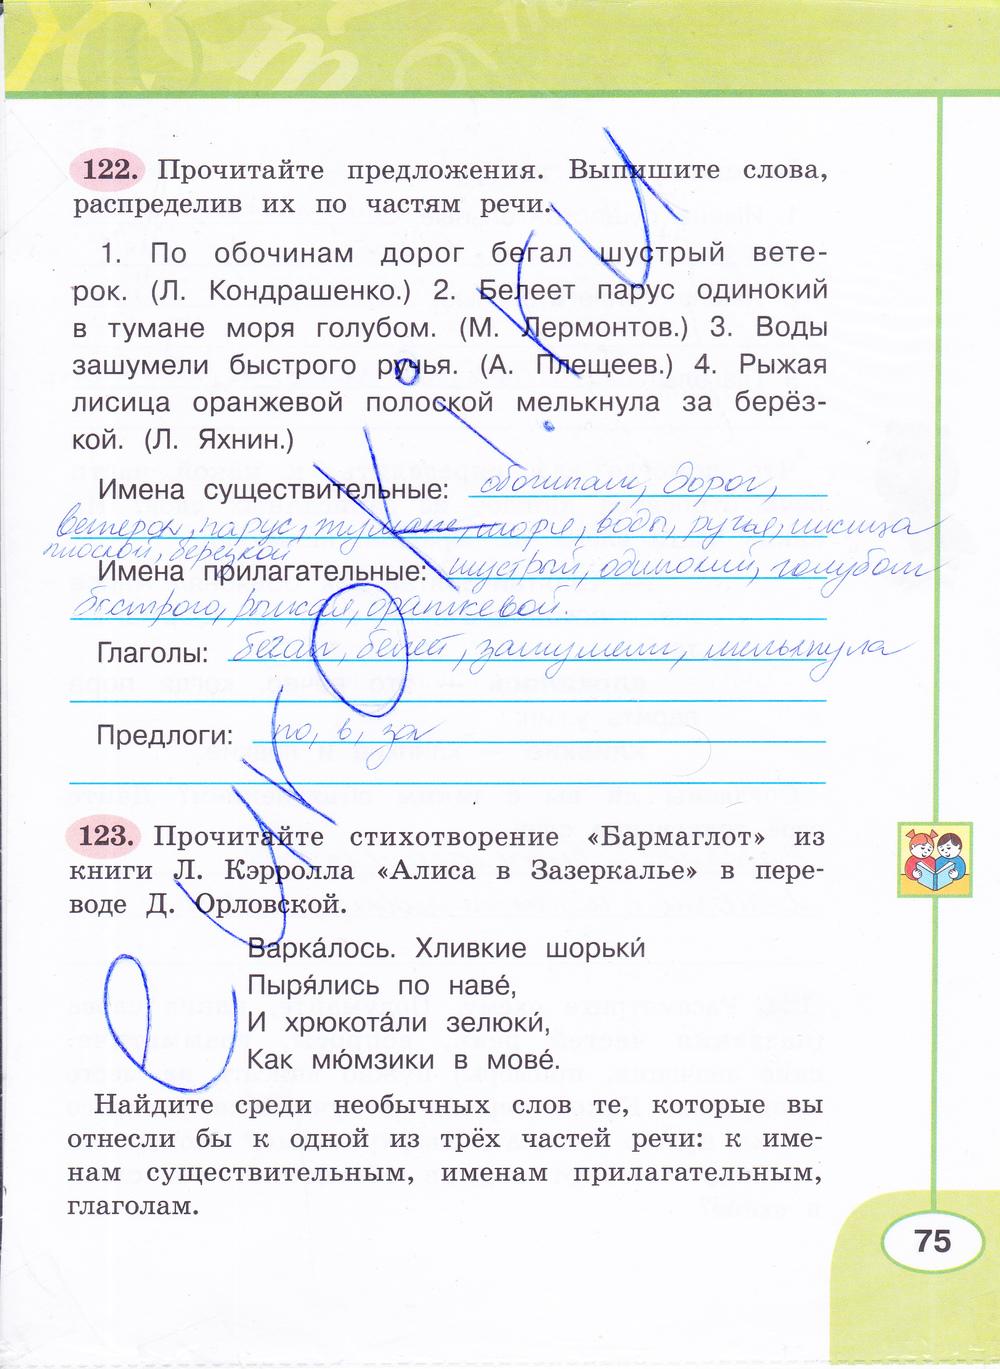 Гдз по русскому языку 2 класс климанова рабочая тетрадь